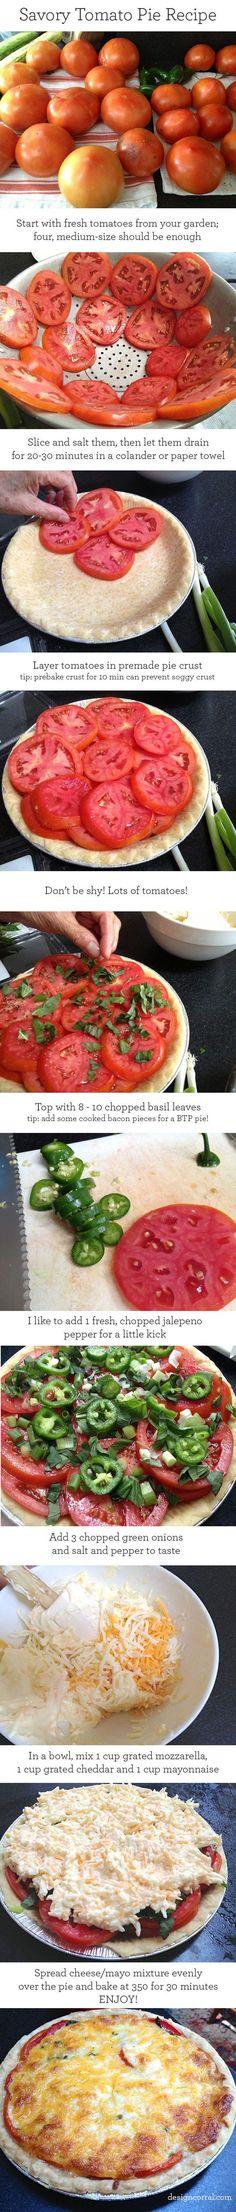 Savory Tomato Pie Recipe Little different than Paula Dean's.